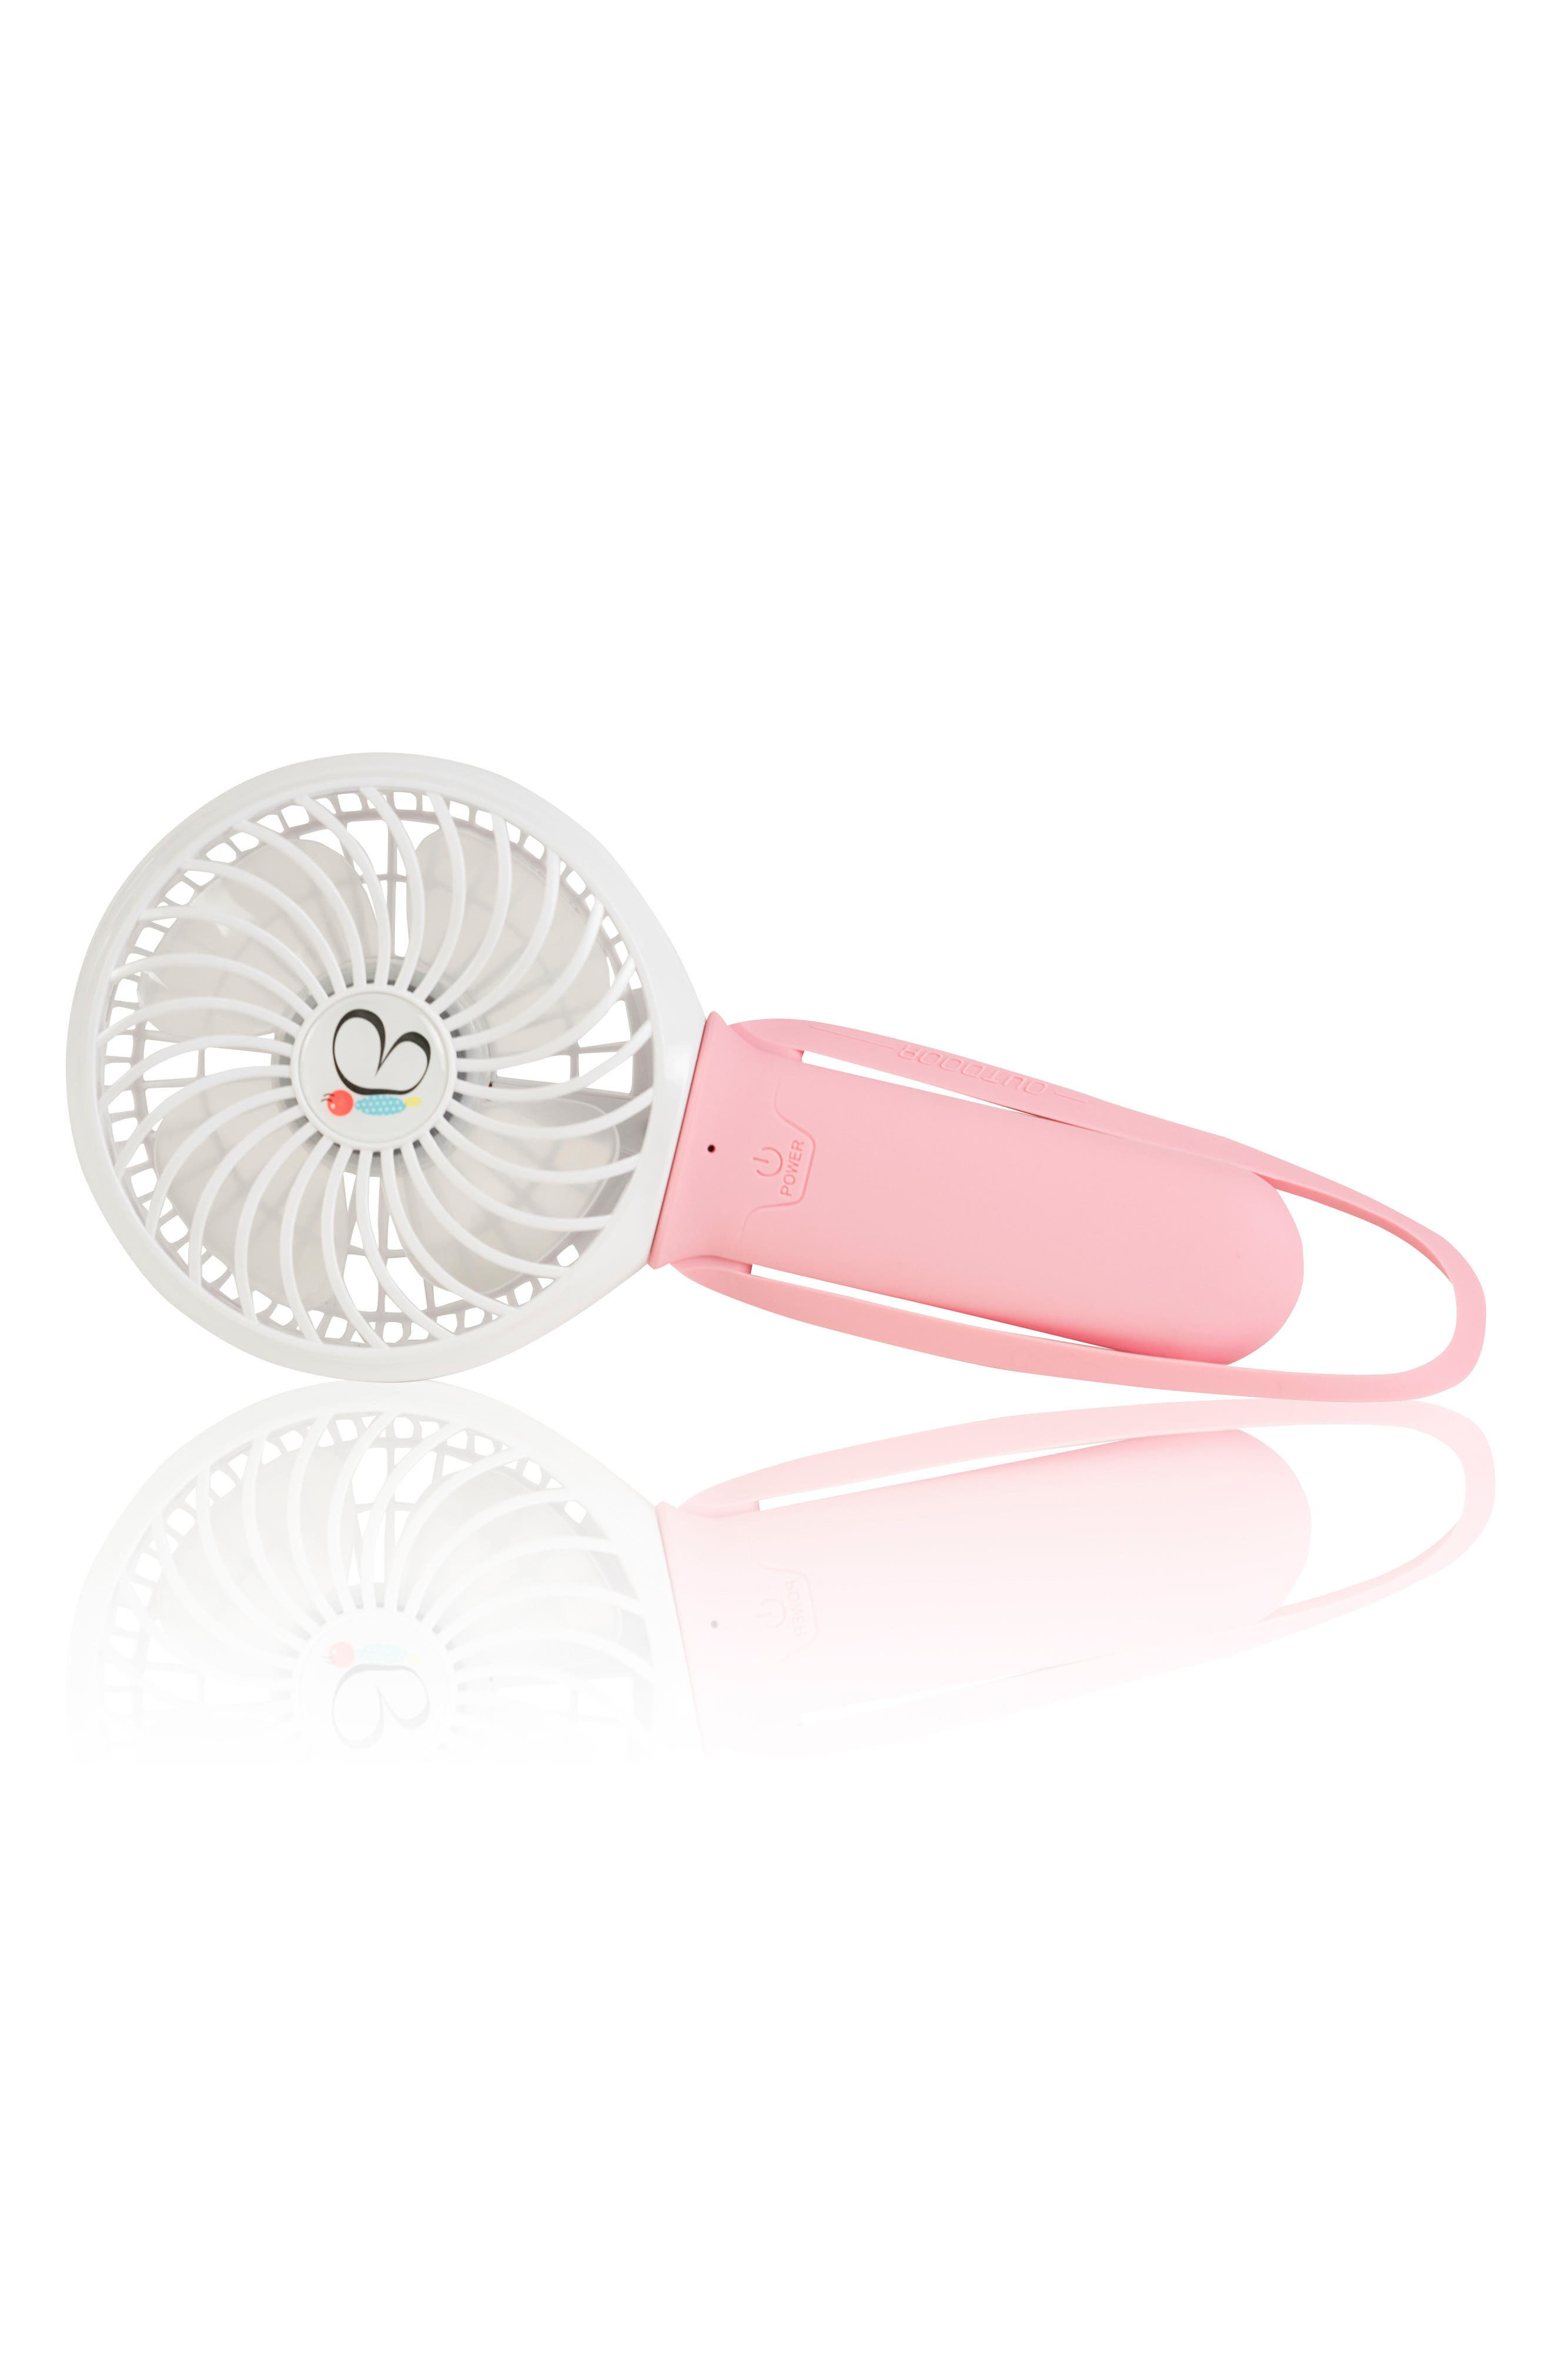 NIKIANI USB Rechargeable Turbo Fan, Main, color, PINK/ WHITE